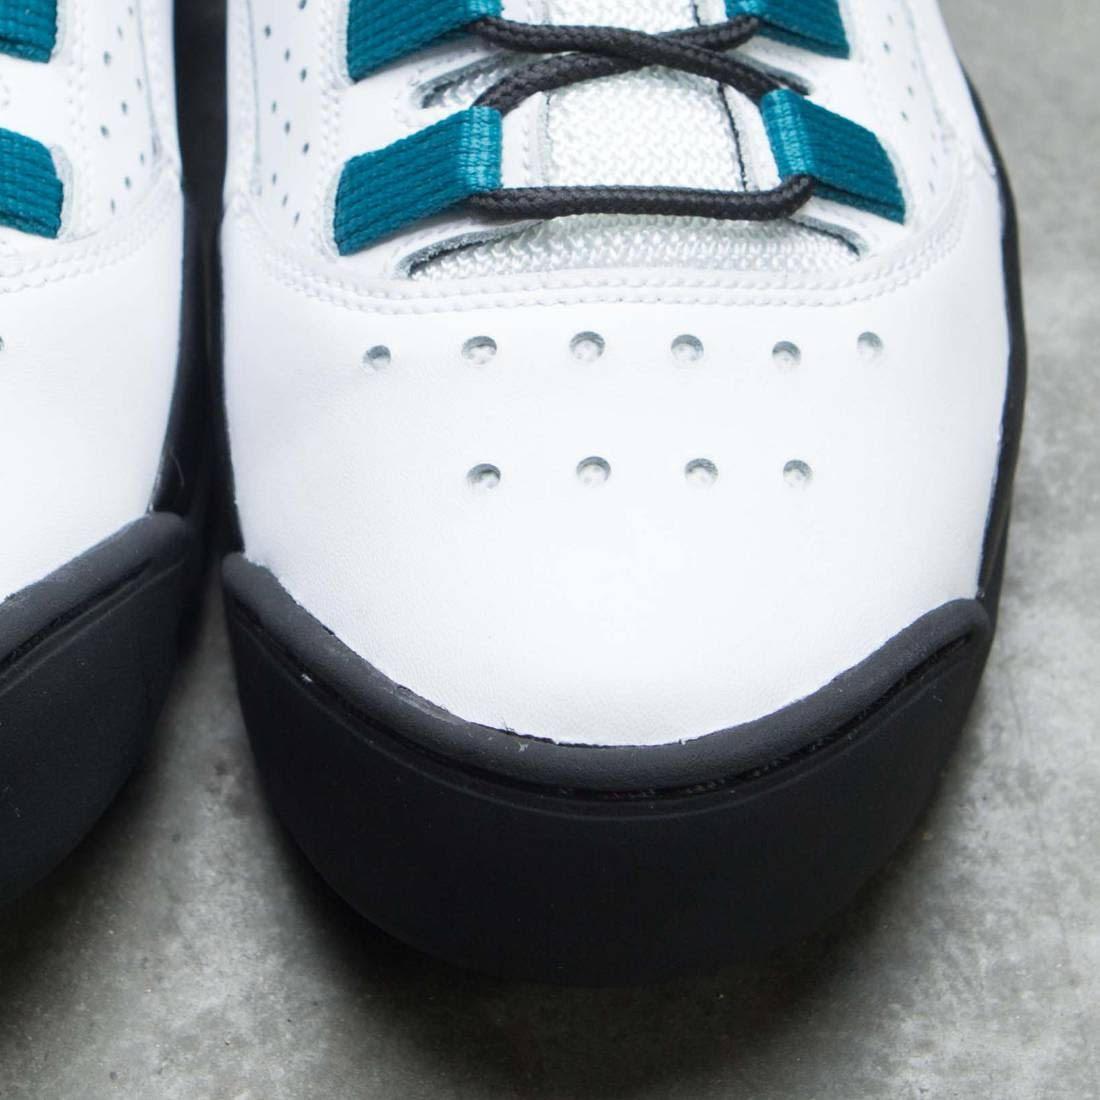 lowest price d67cd b4902 Nike-Air-Darwin-OG-White-Teal-Black-3